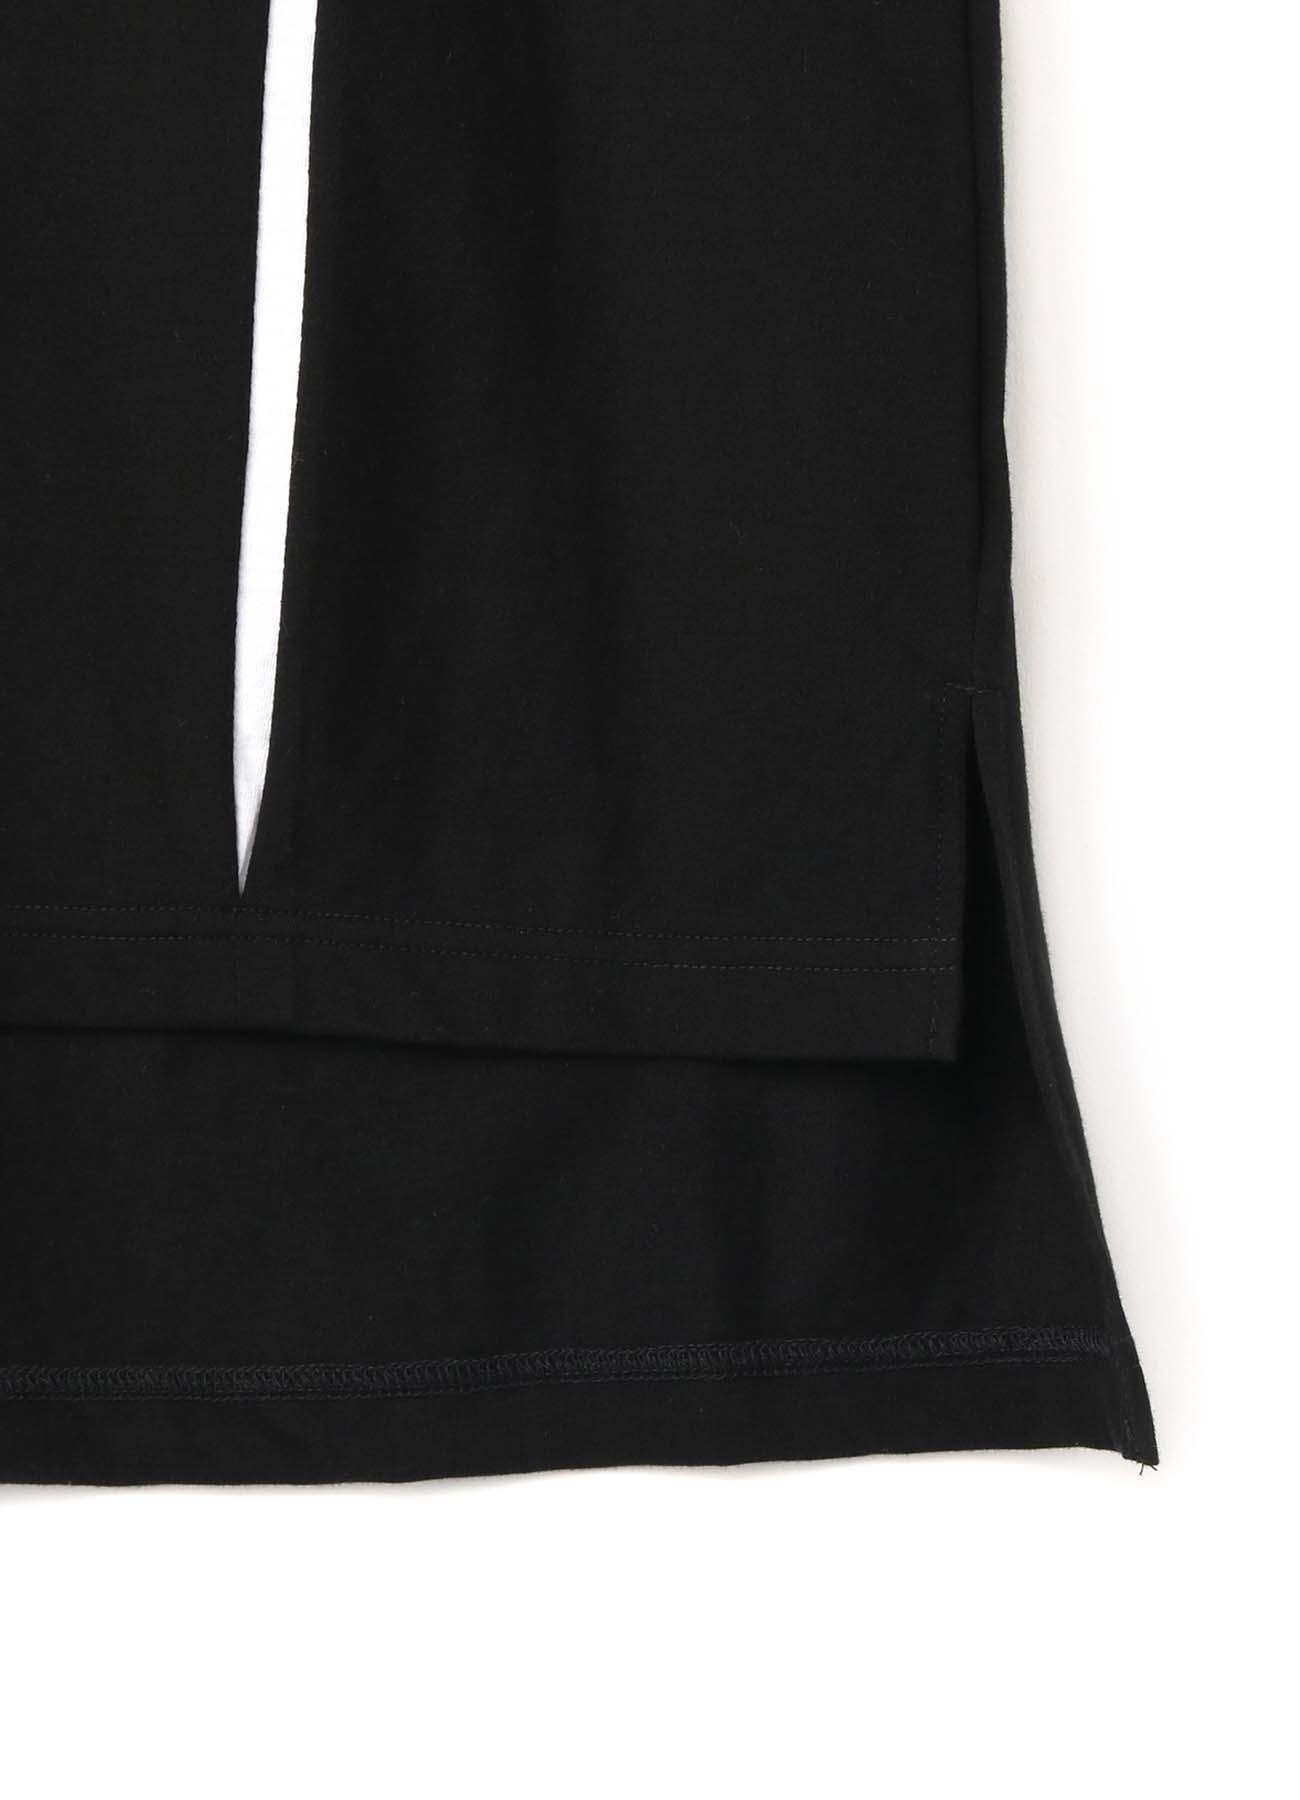 30/Cotton Jersey Cutting Blade Cut Sew